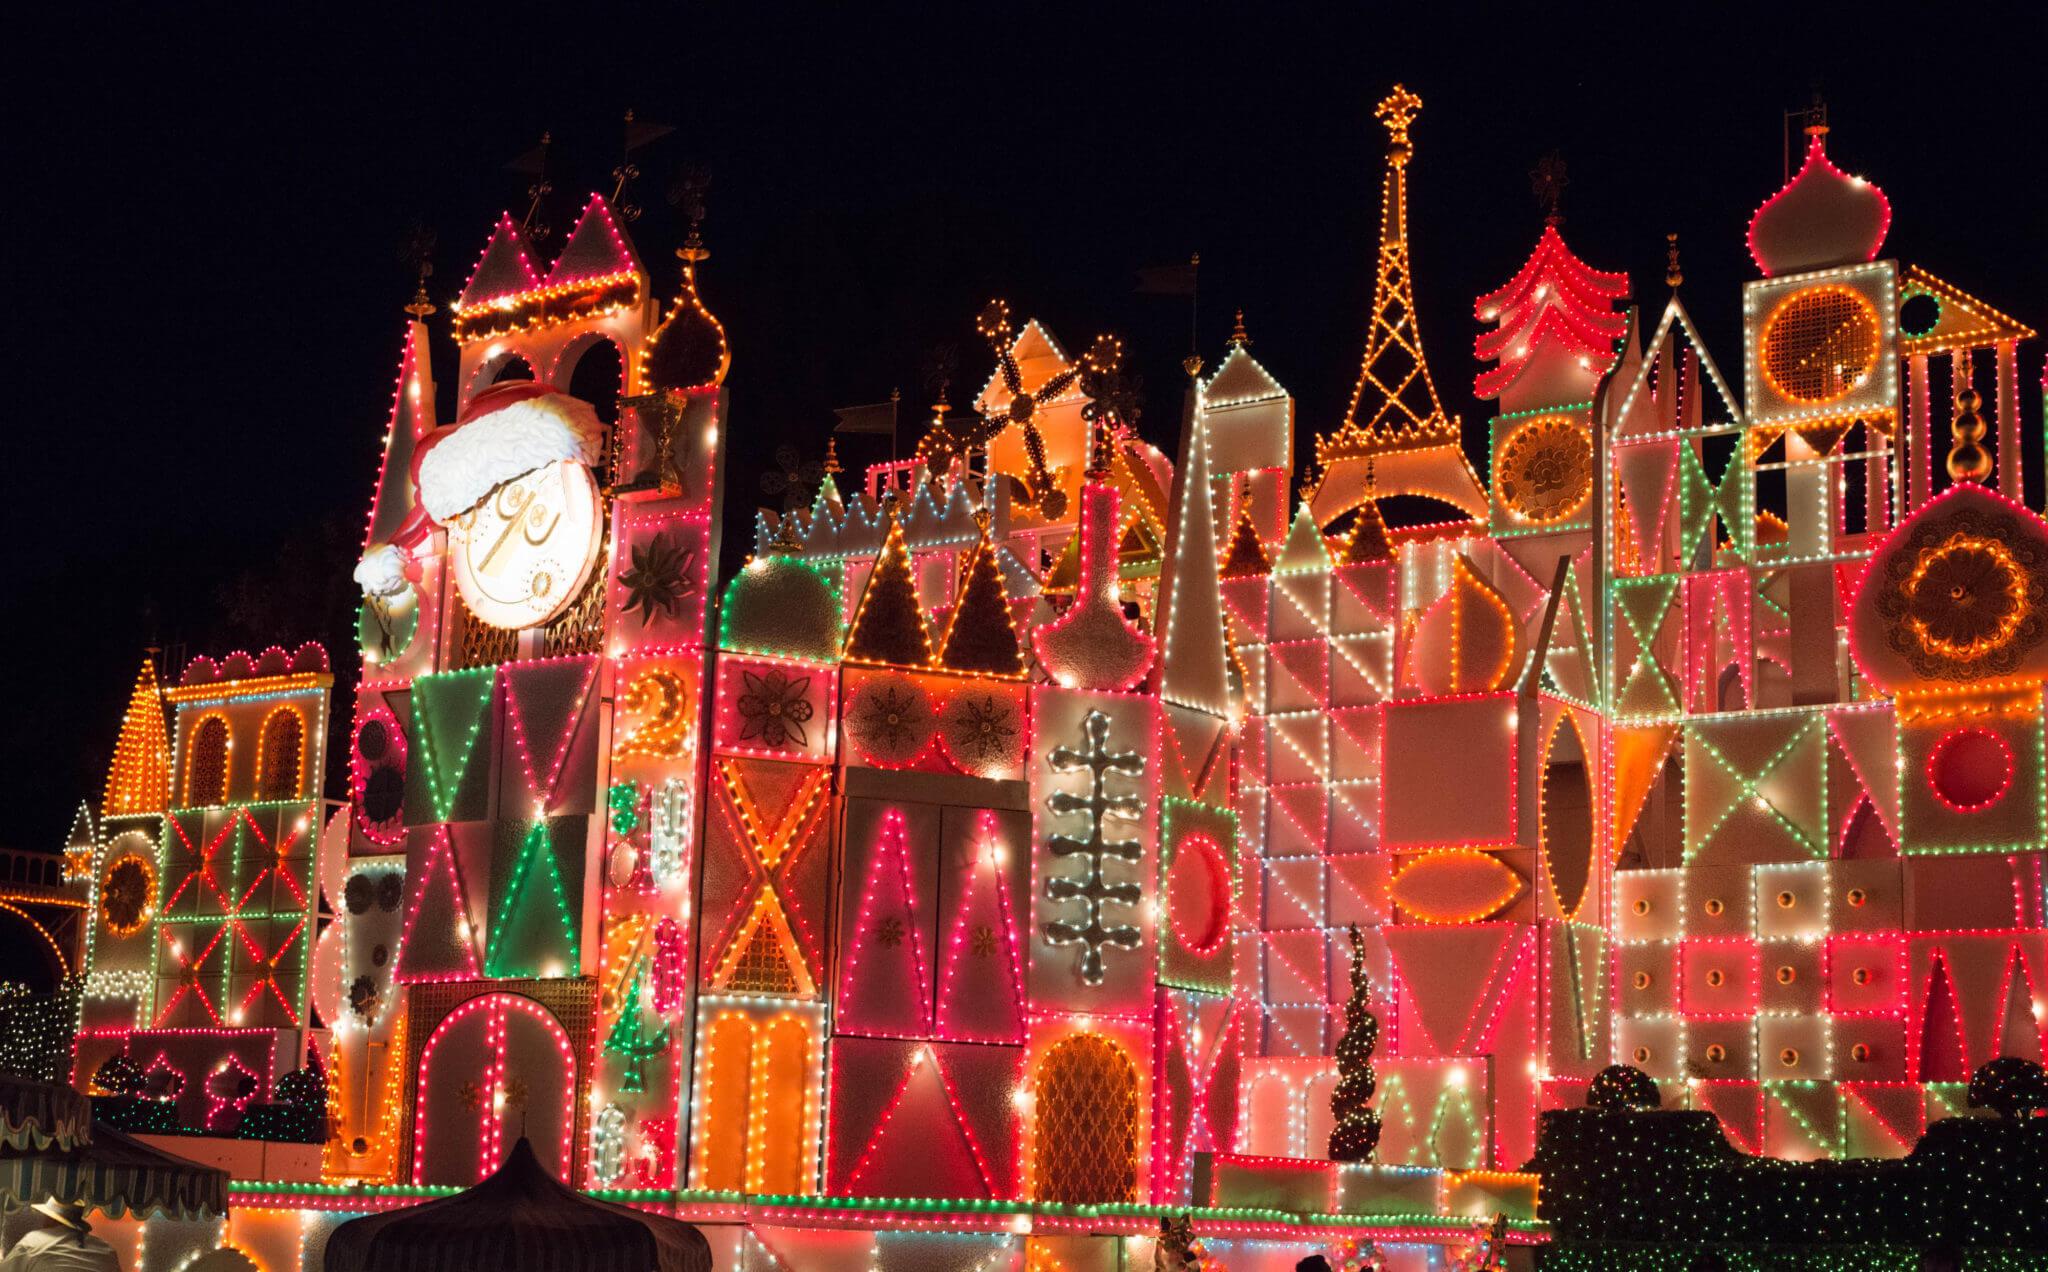 it's a small holiday overlay - Disneyland